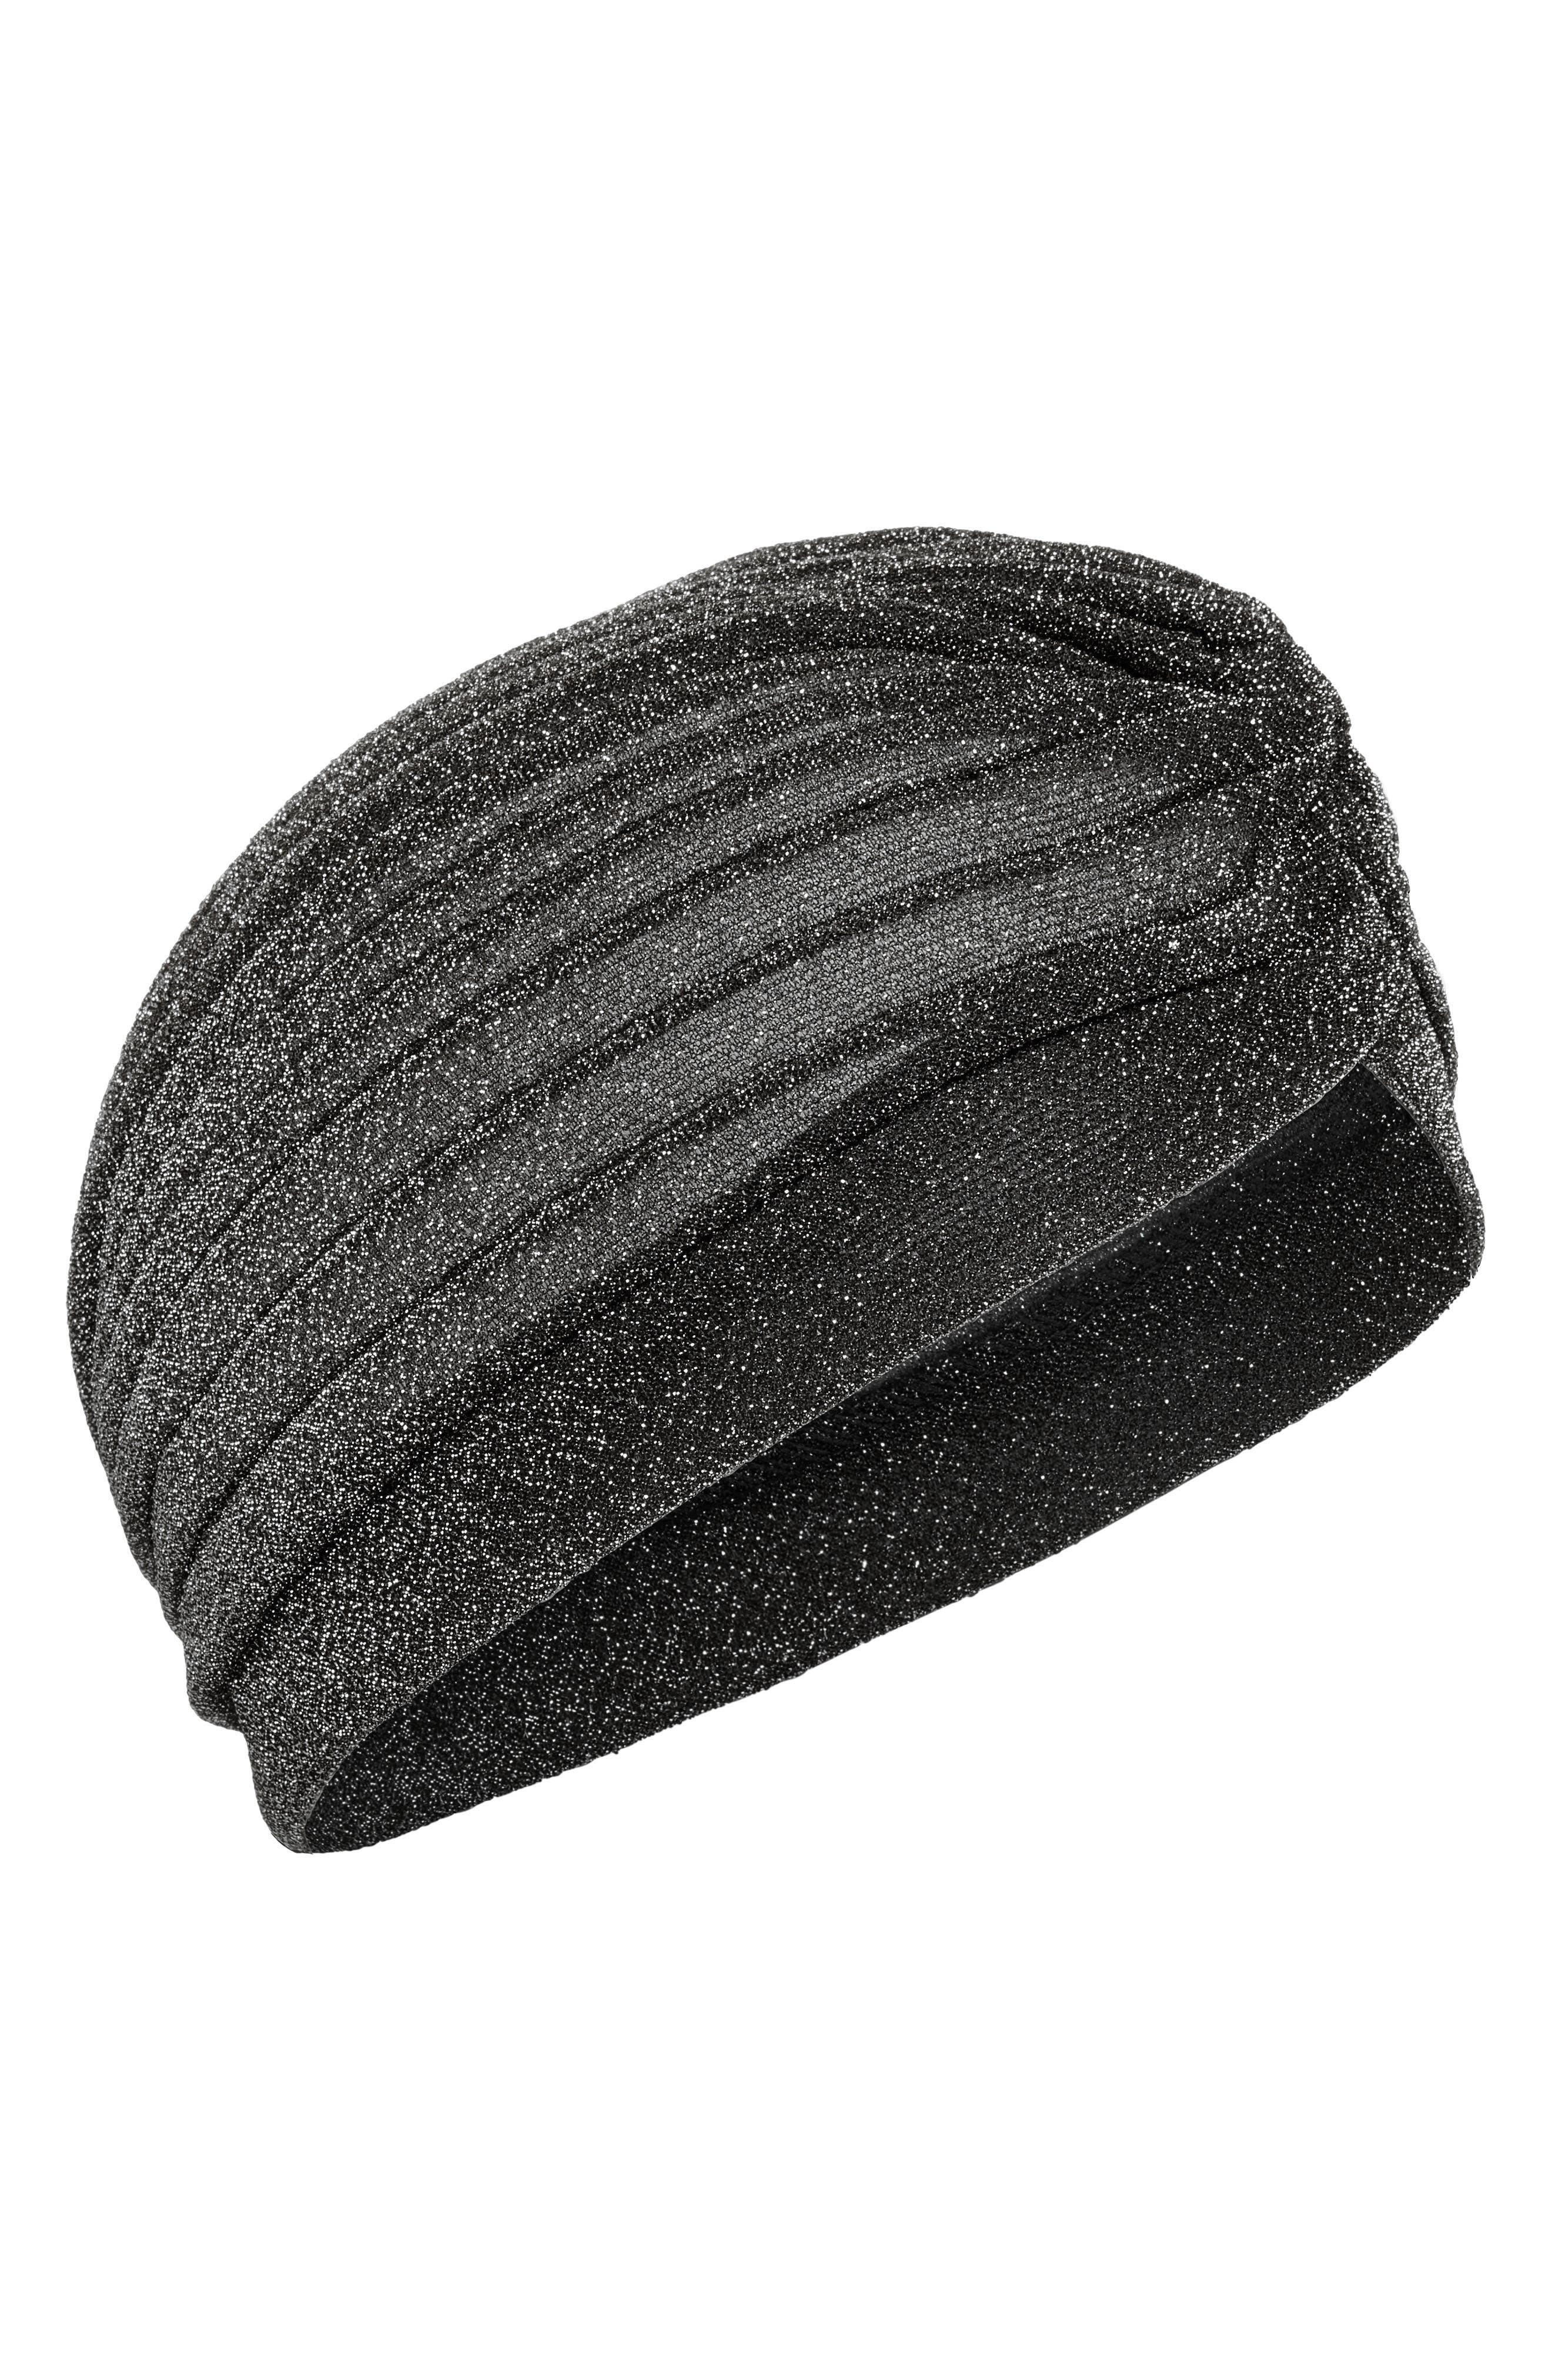 TASHA, Metallic Turban, Main thumbnail 1, color, 044